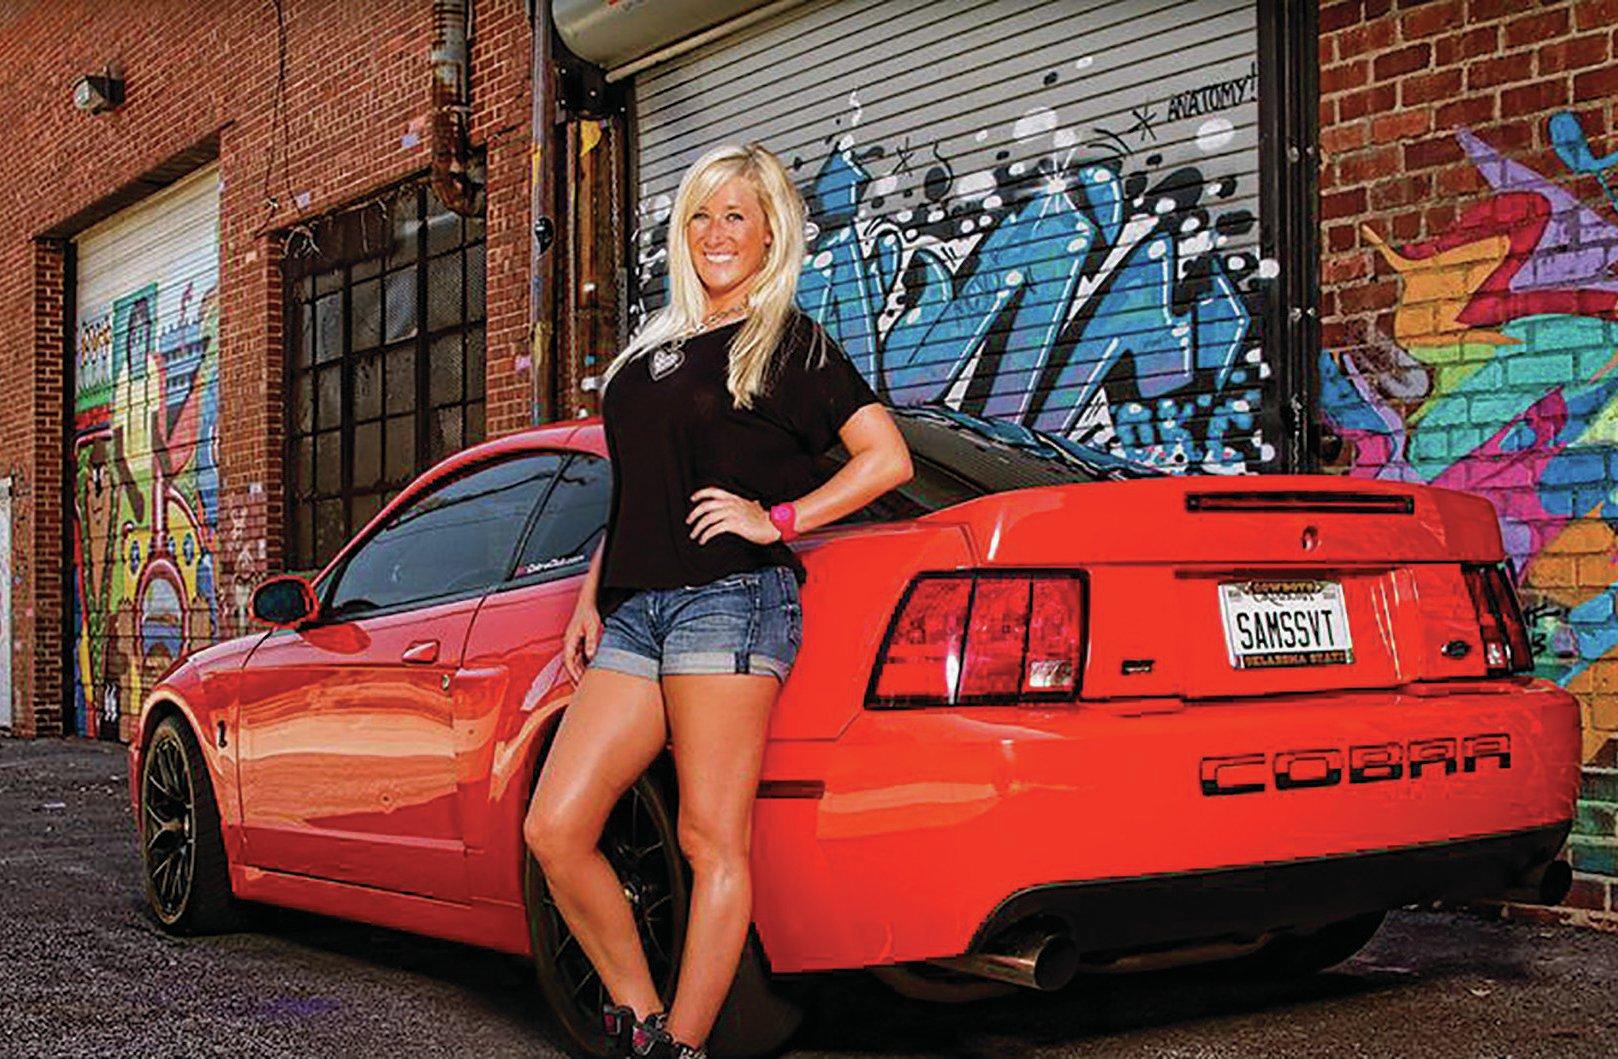 2004 Ford Mustang Samantha Garvey 2